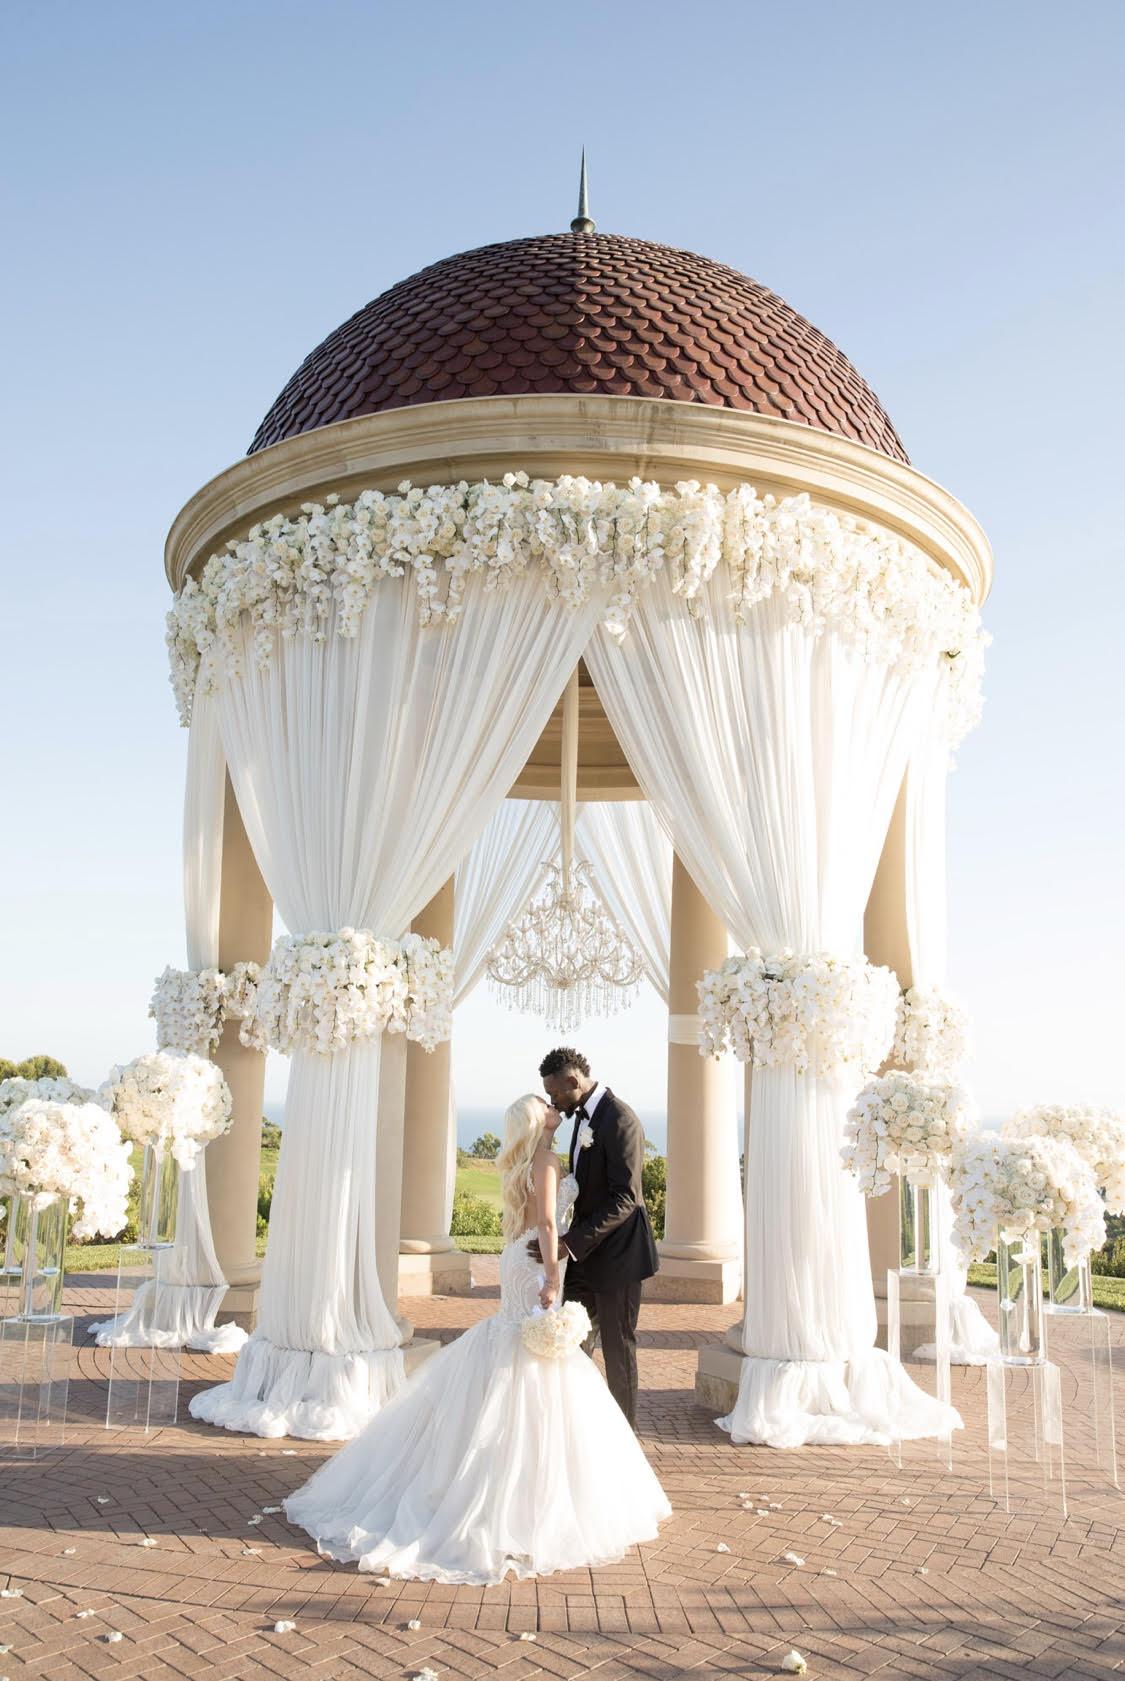 ©Duke Photography©Jeanne Savage esküvőszervező©Nisie Vorachard virágos